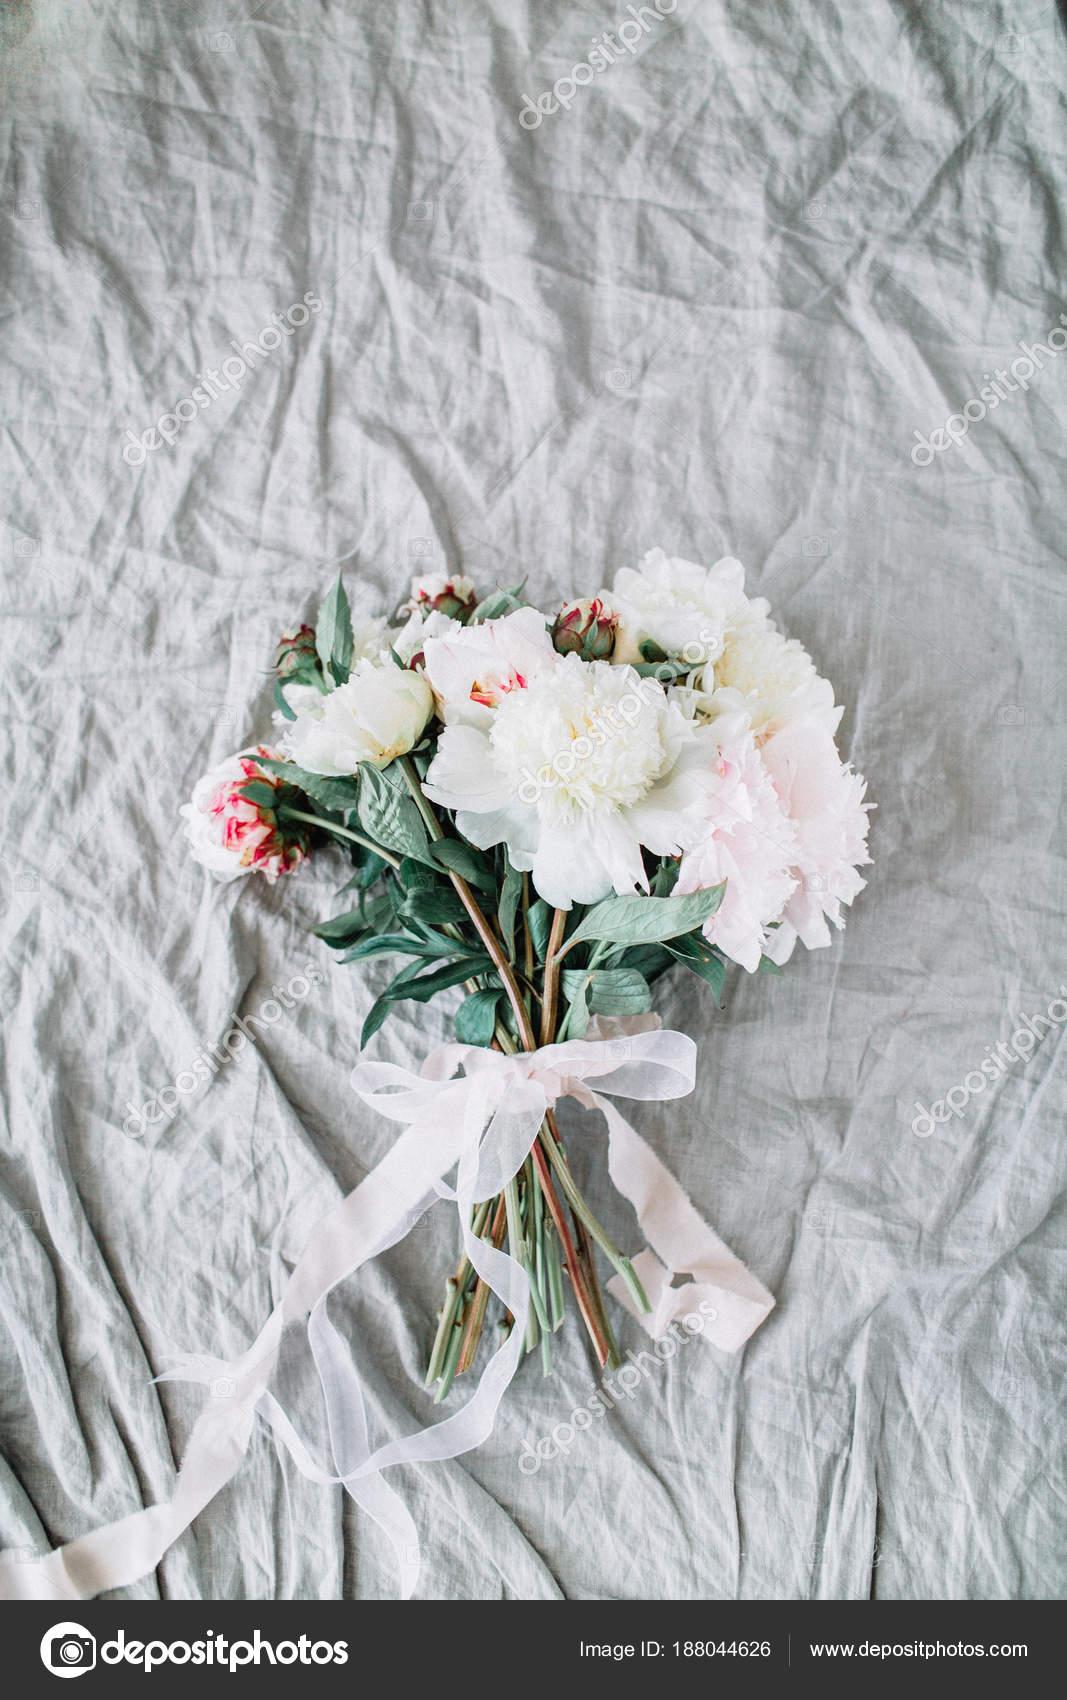 Bridal Wedding Flowers Bouquet White Peonies Ribbon Grey Linen Flat ...